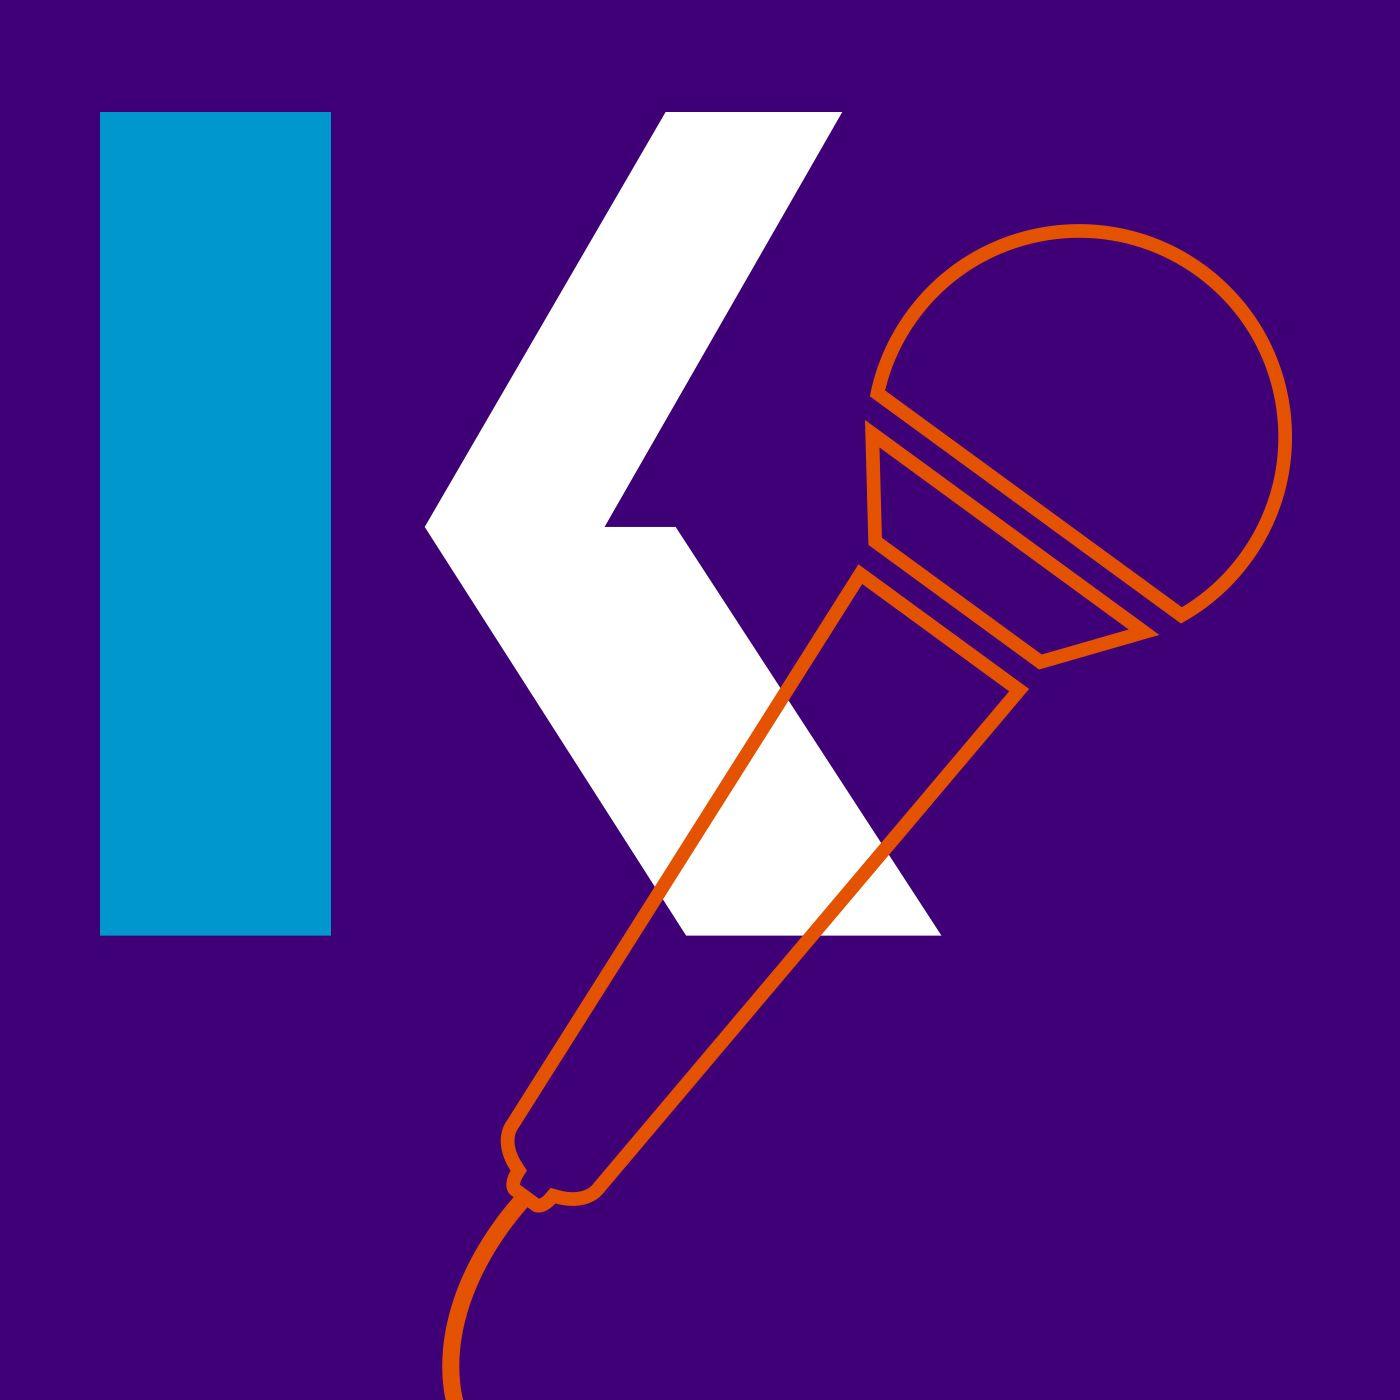 Kaplan's NCLEX Prepcast - Episode 31 - Surviving your first year in nursing practice